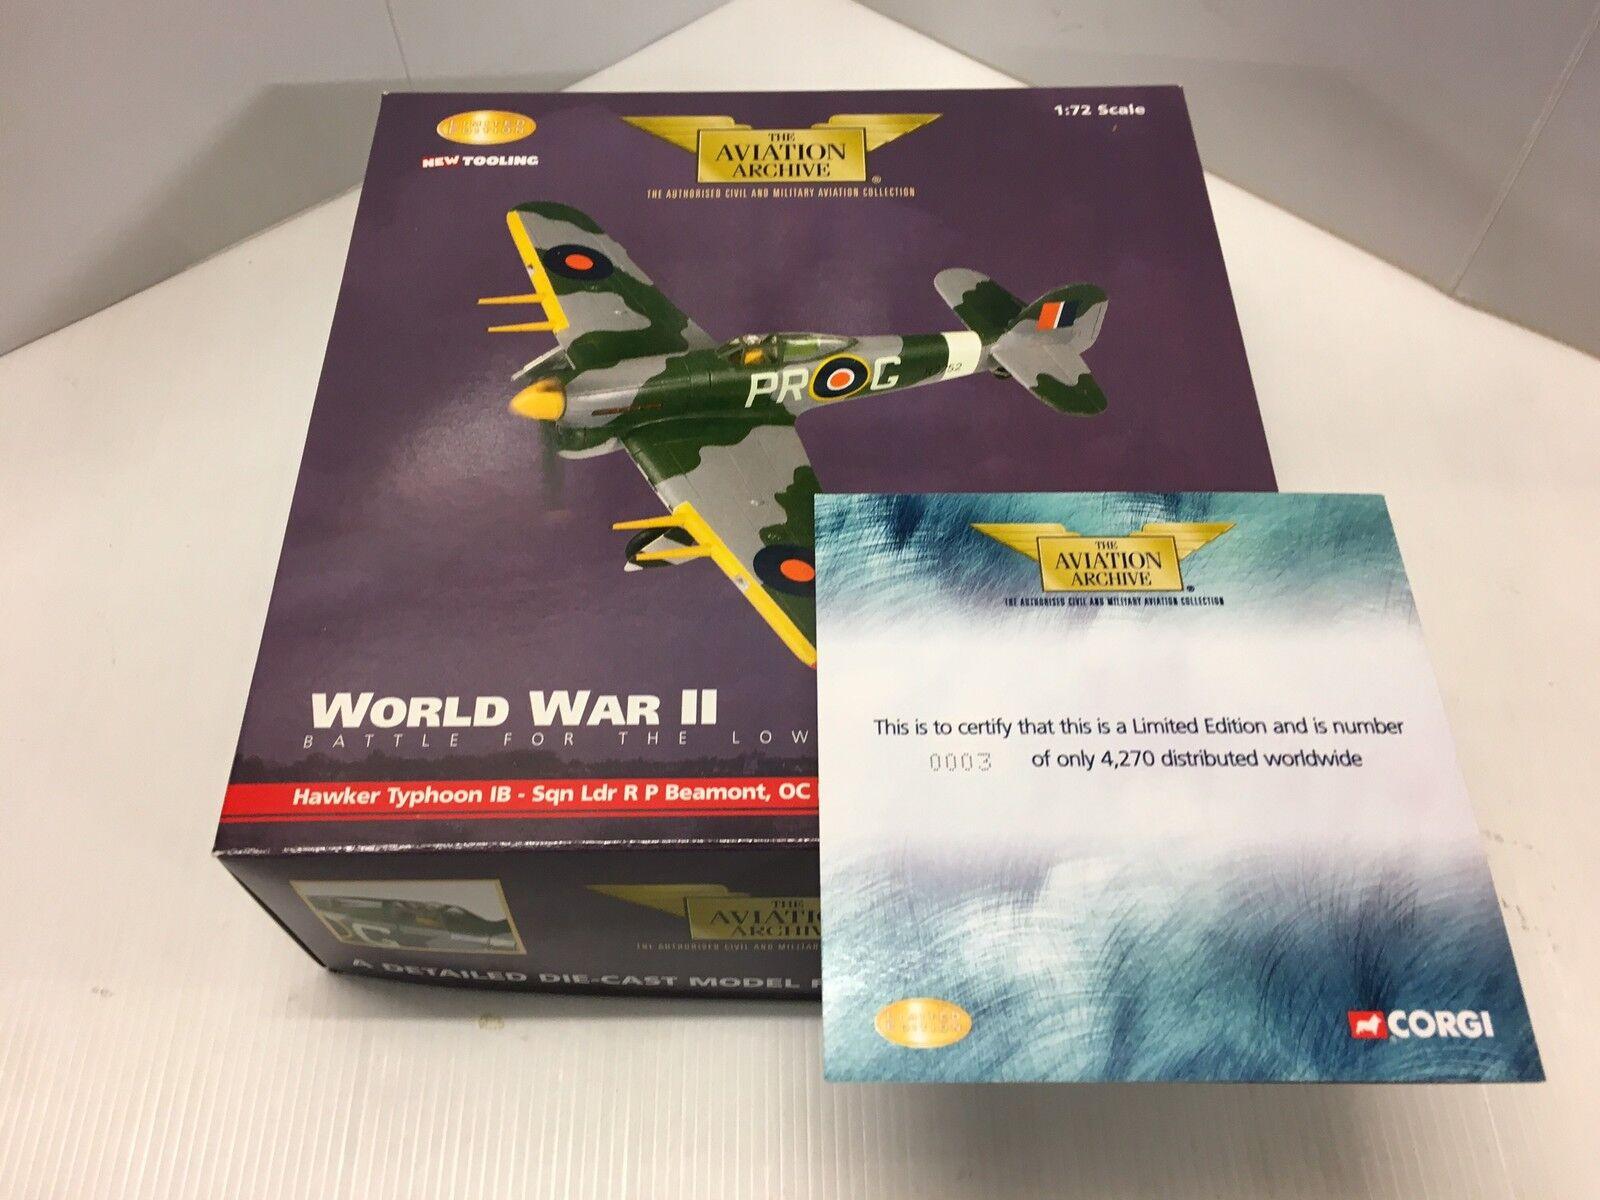 Corgi AA36502 Hawker Typhoon MkIB SW417 MR-X No245 Squadron Ltd Ed 0003 of 4270